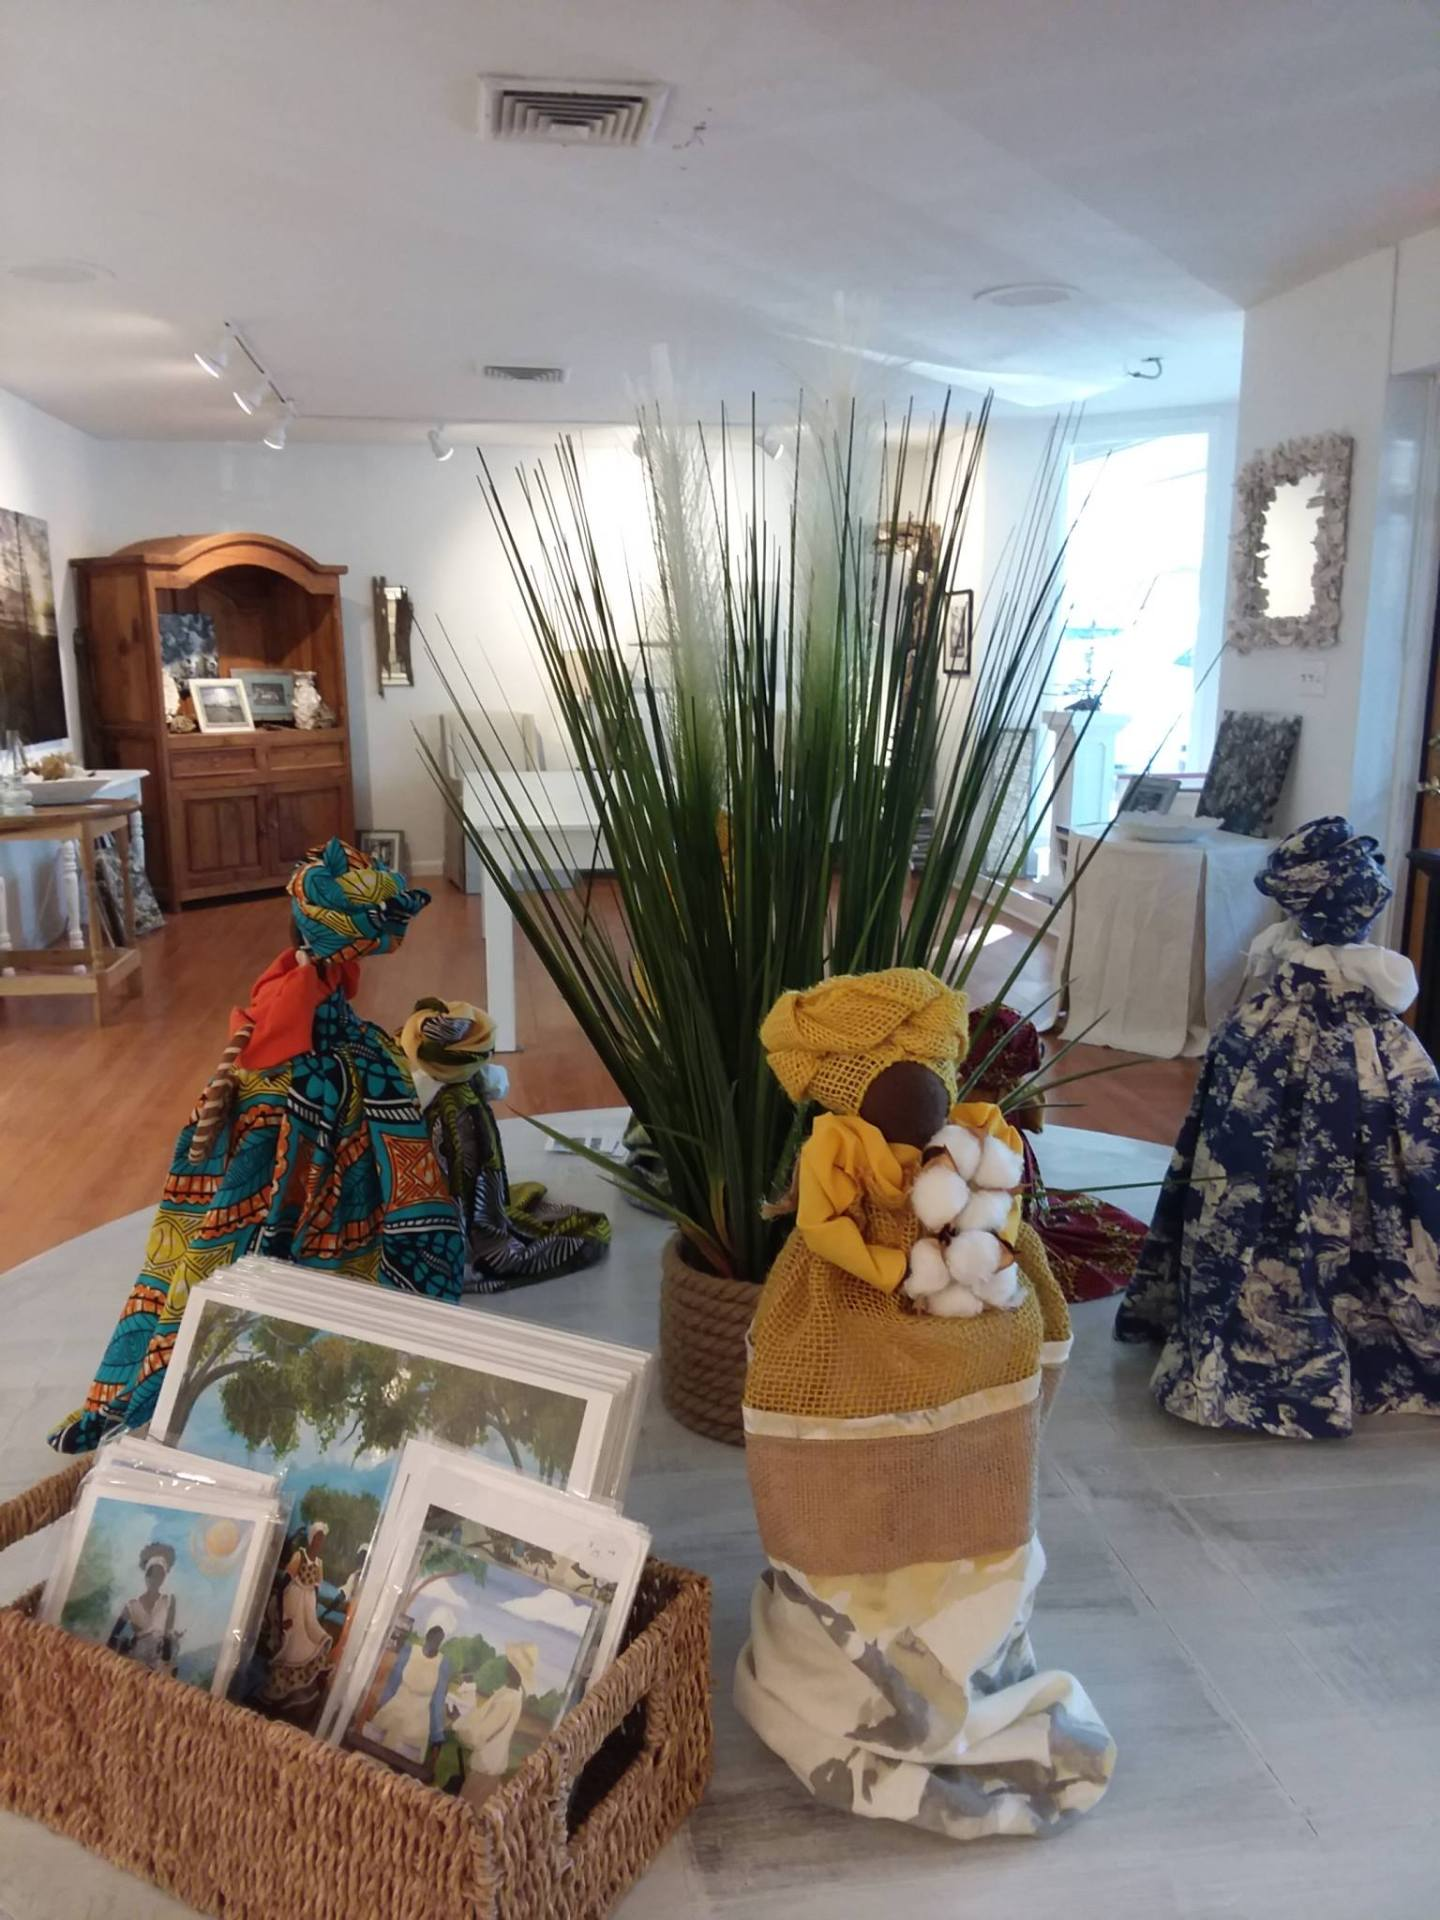 58384262_10215841316400684_3586541422964113408_o-1440x1920 International Cultural Gullah Artist Sonja Griffin Evans Unveils Newest Art Studio